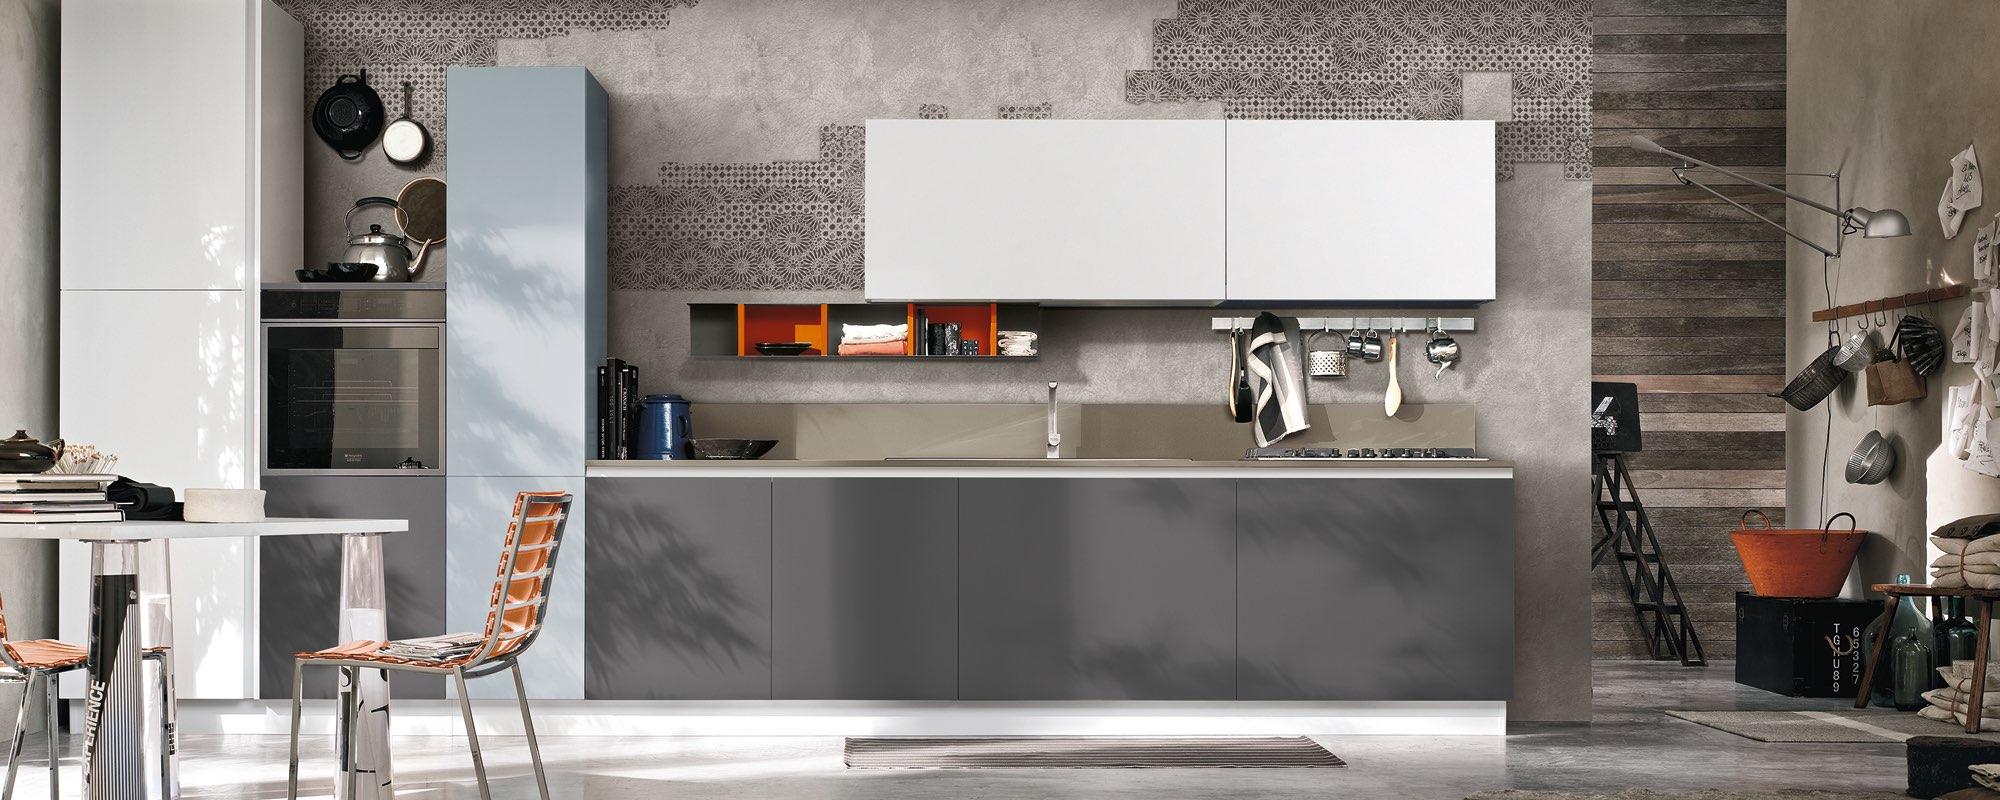 Cucine Stosa Prezzi 2018 cucina archivi - arredamenti benevelli